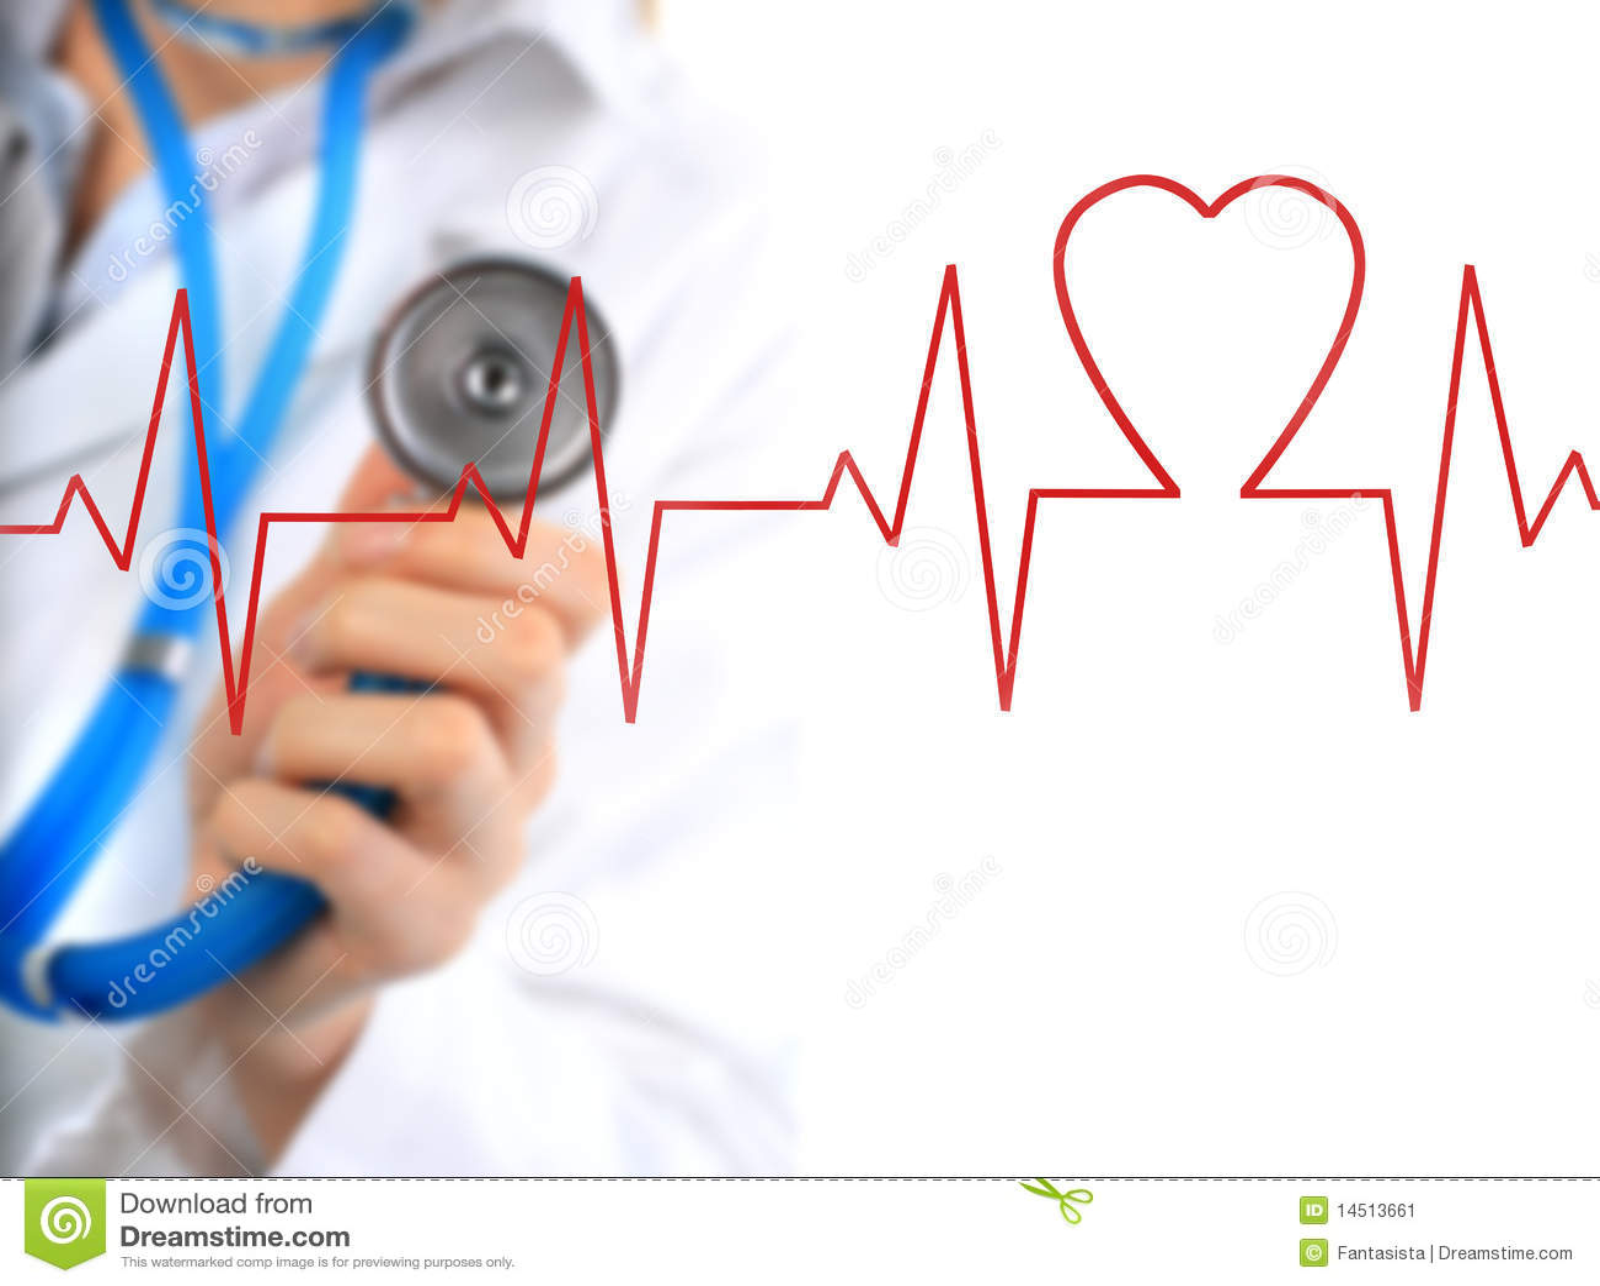 Конкурсы для врачей кардиологов